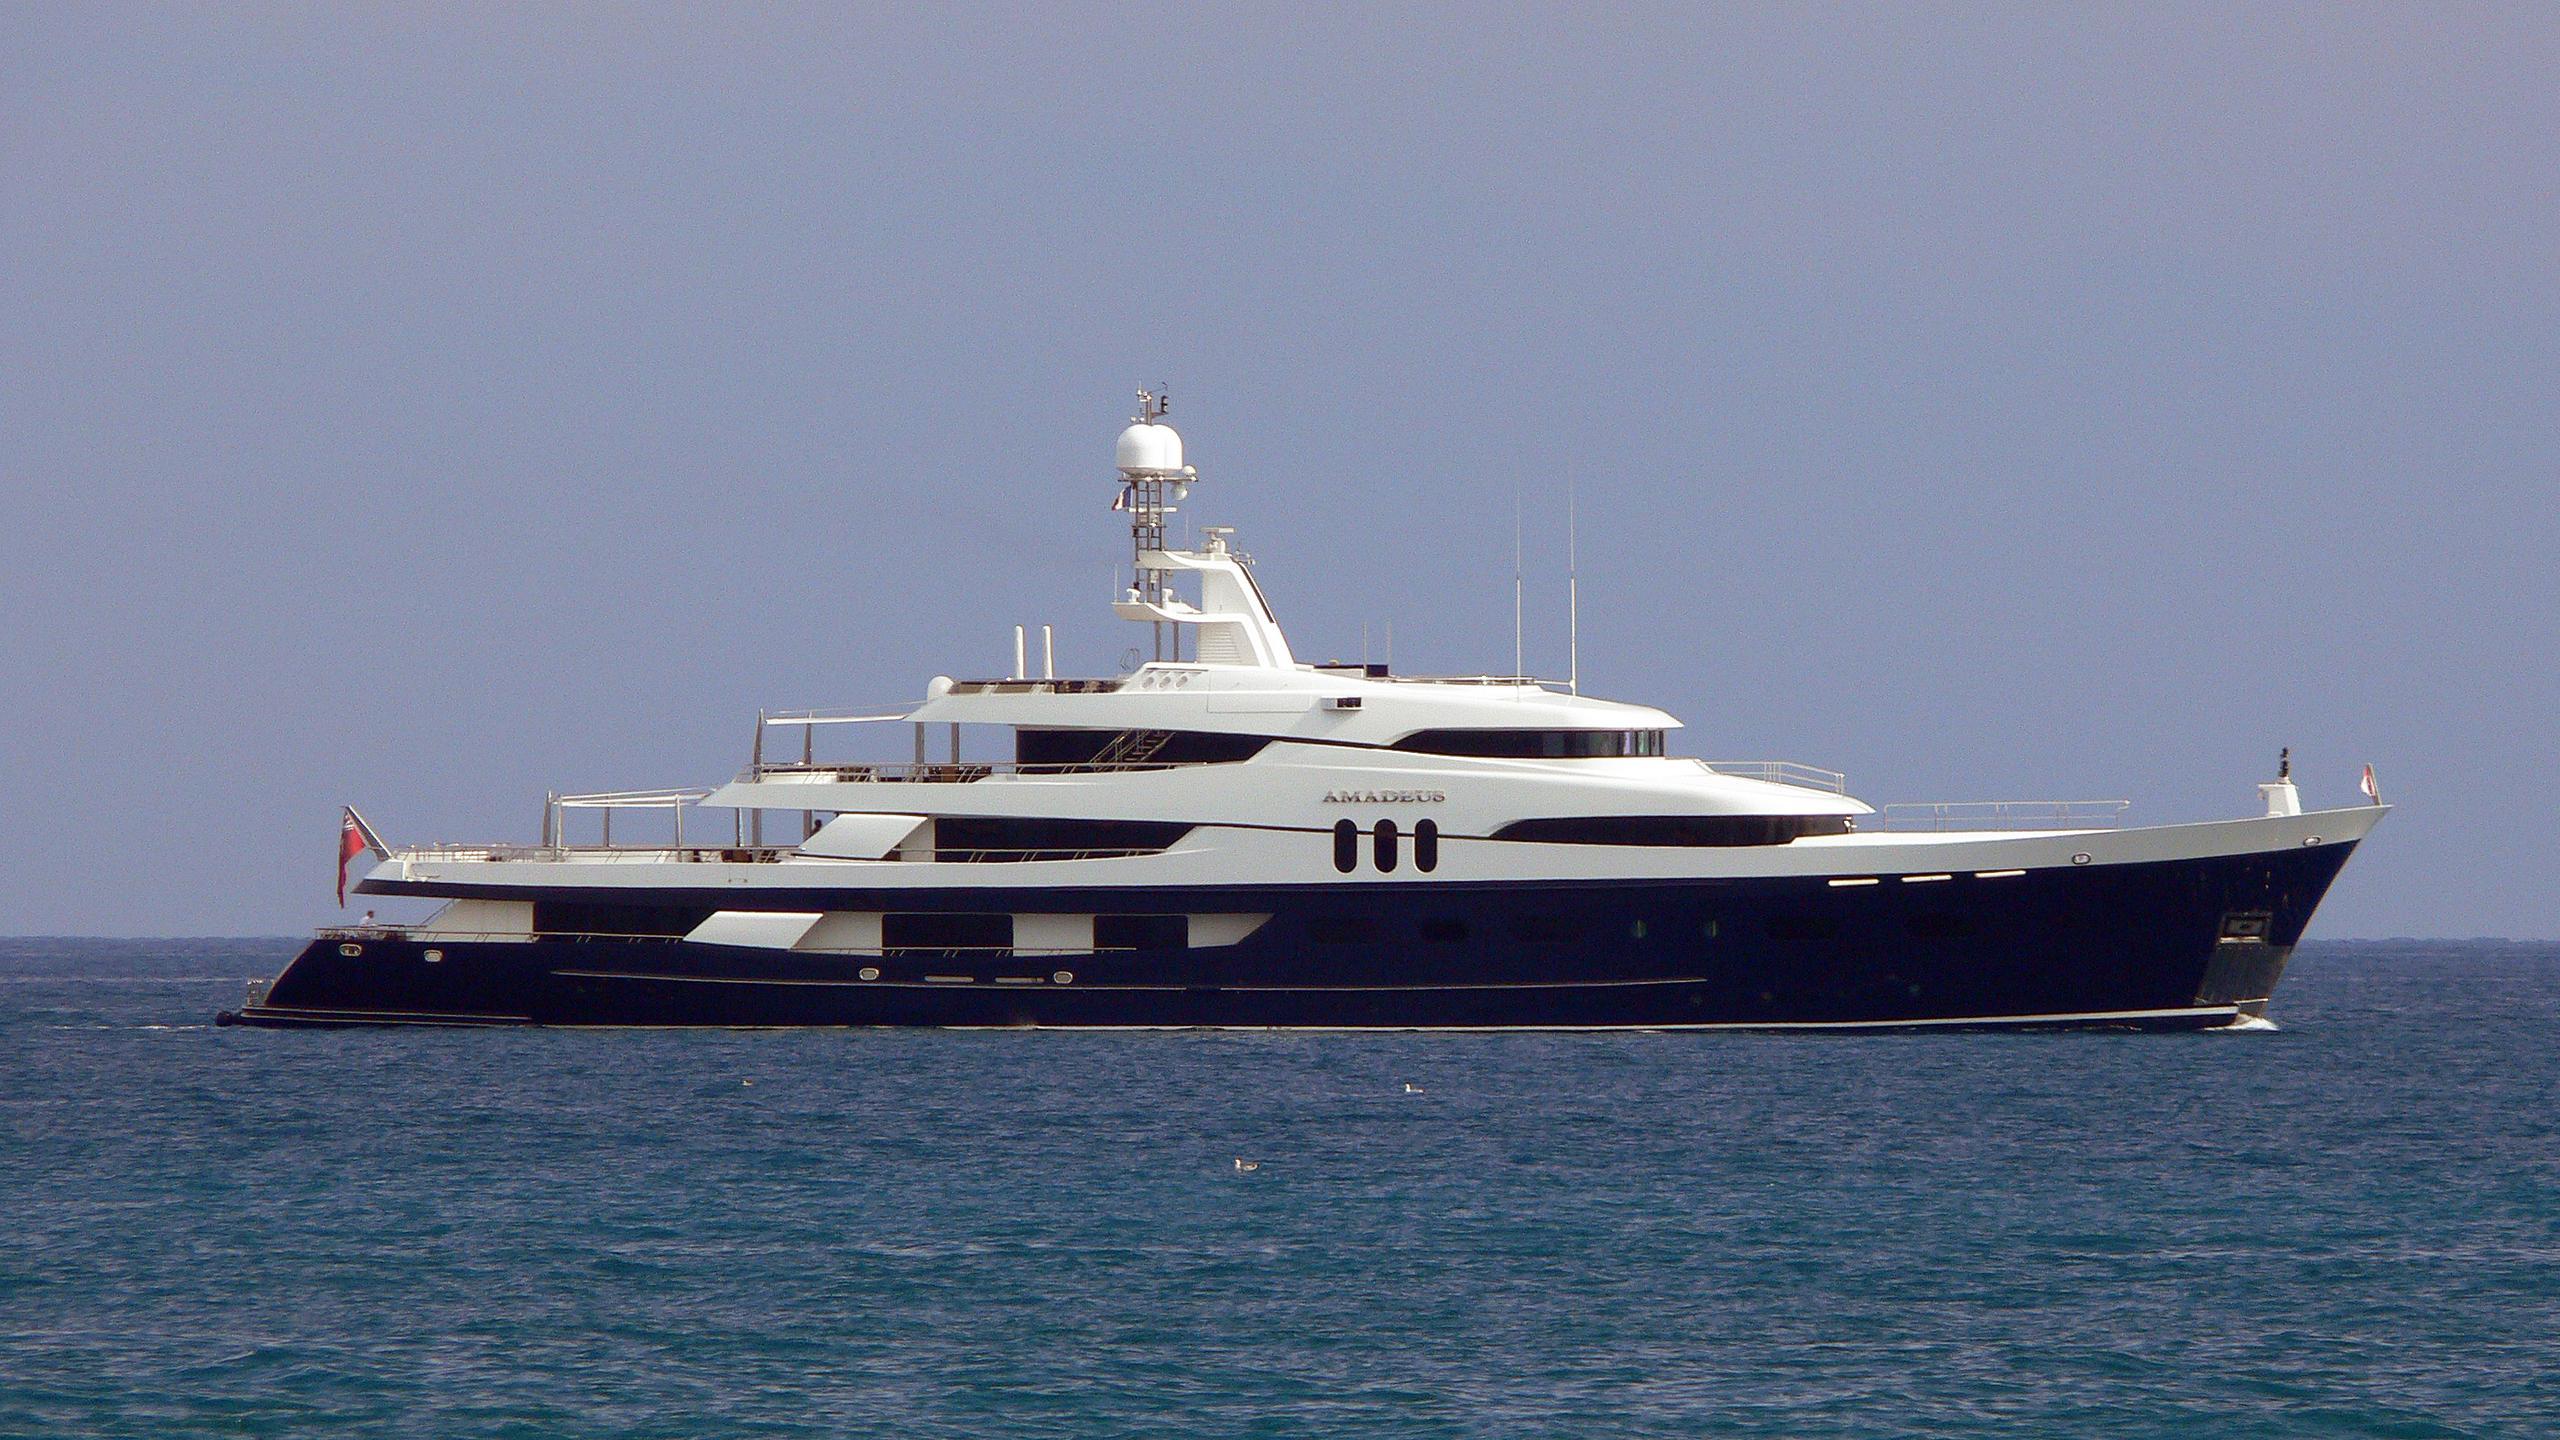 felix-motor-yacht-amadeus-1969-70m-profile